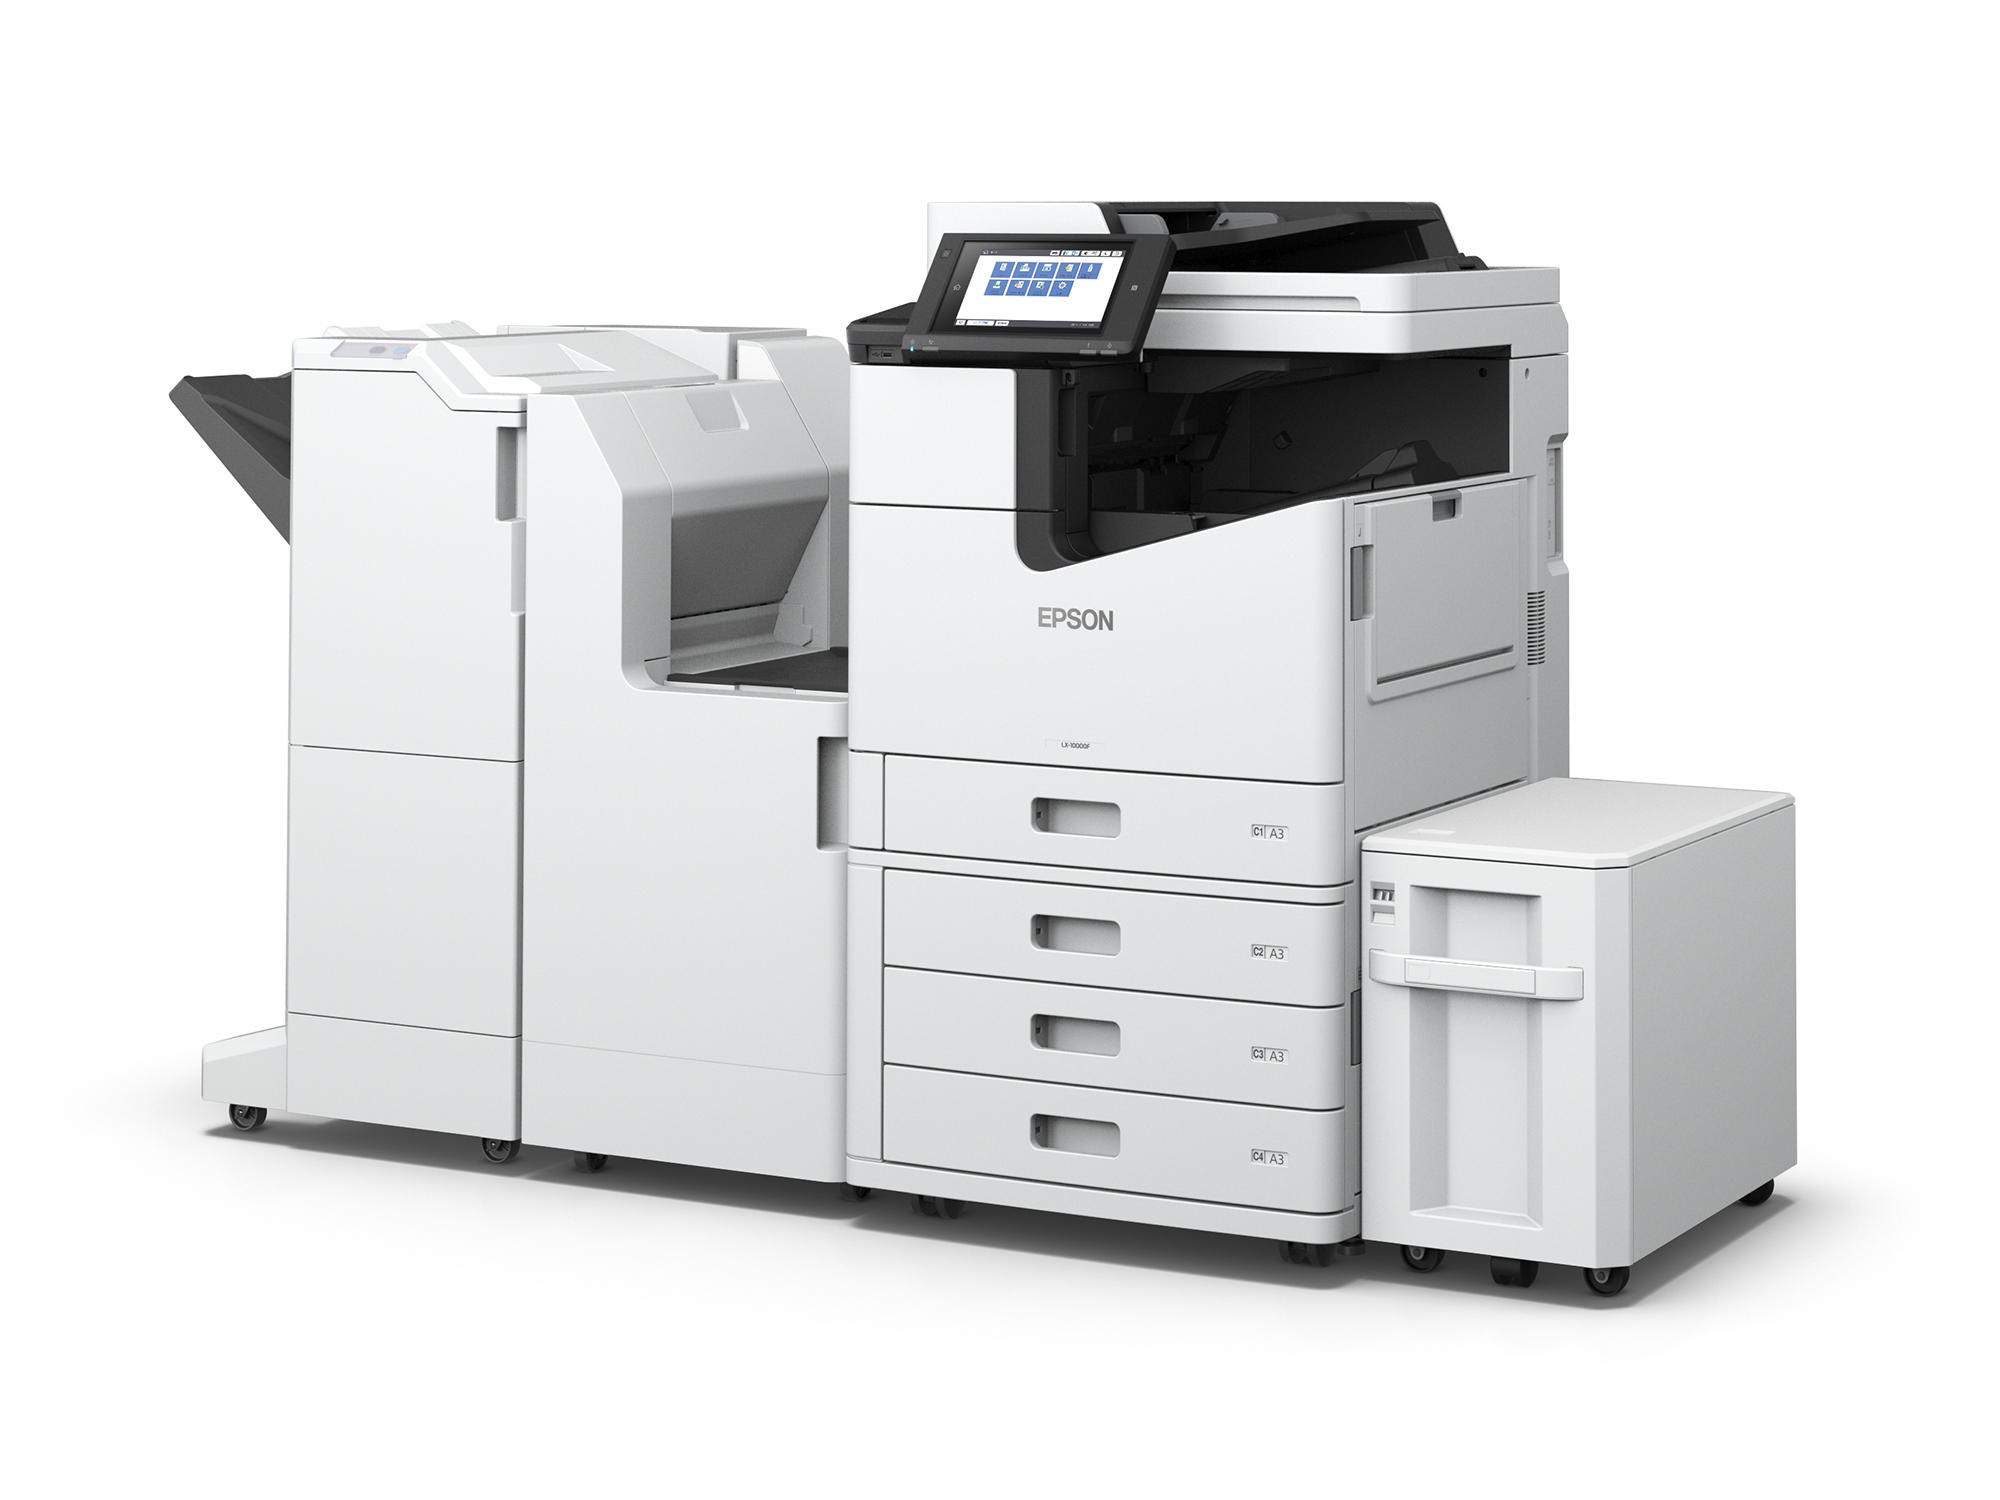 Epson WorkForce Enterprise WF-C20590 finisher, bridge unit and high capacity paper unit